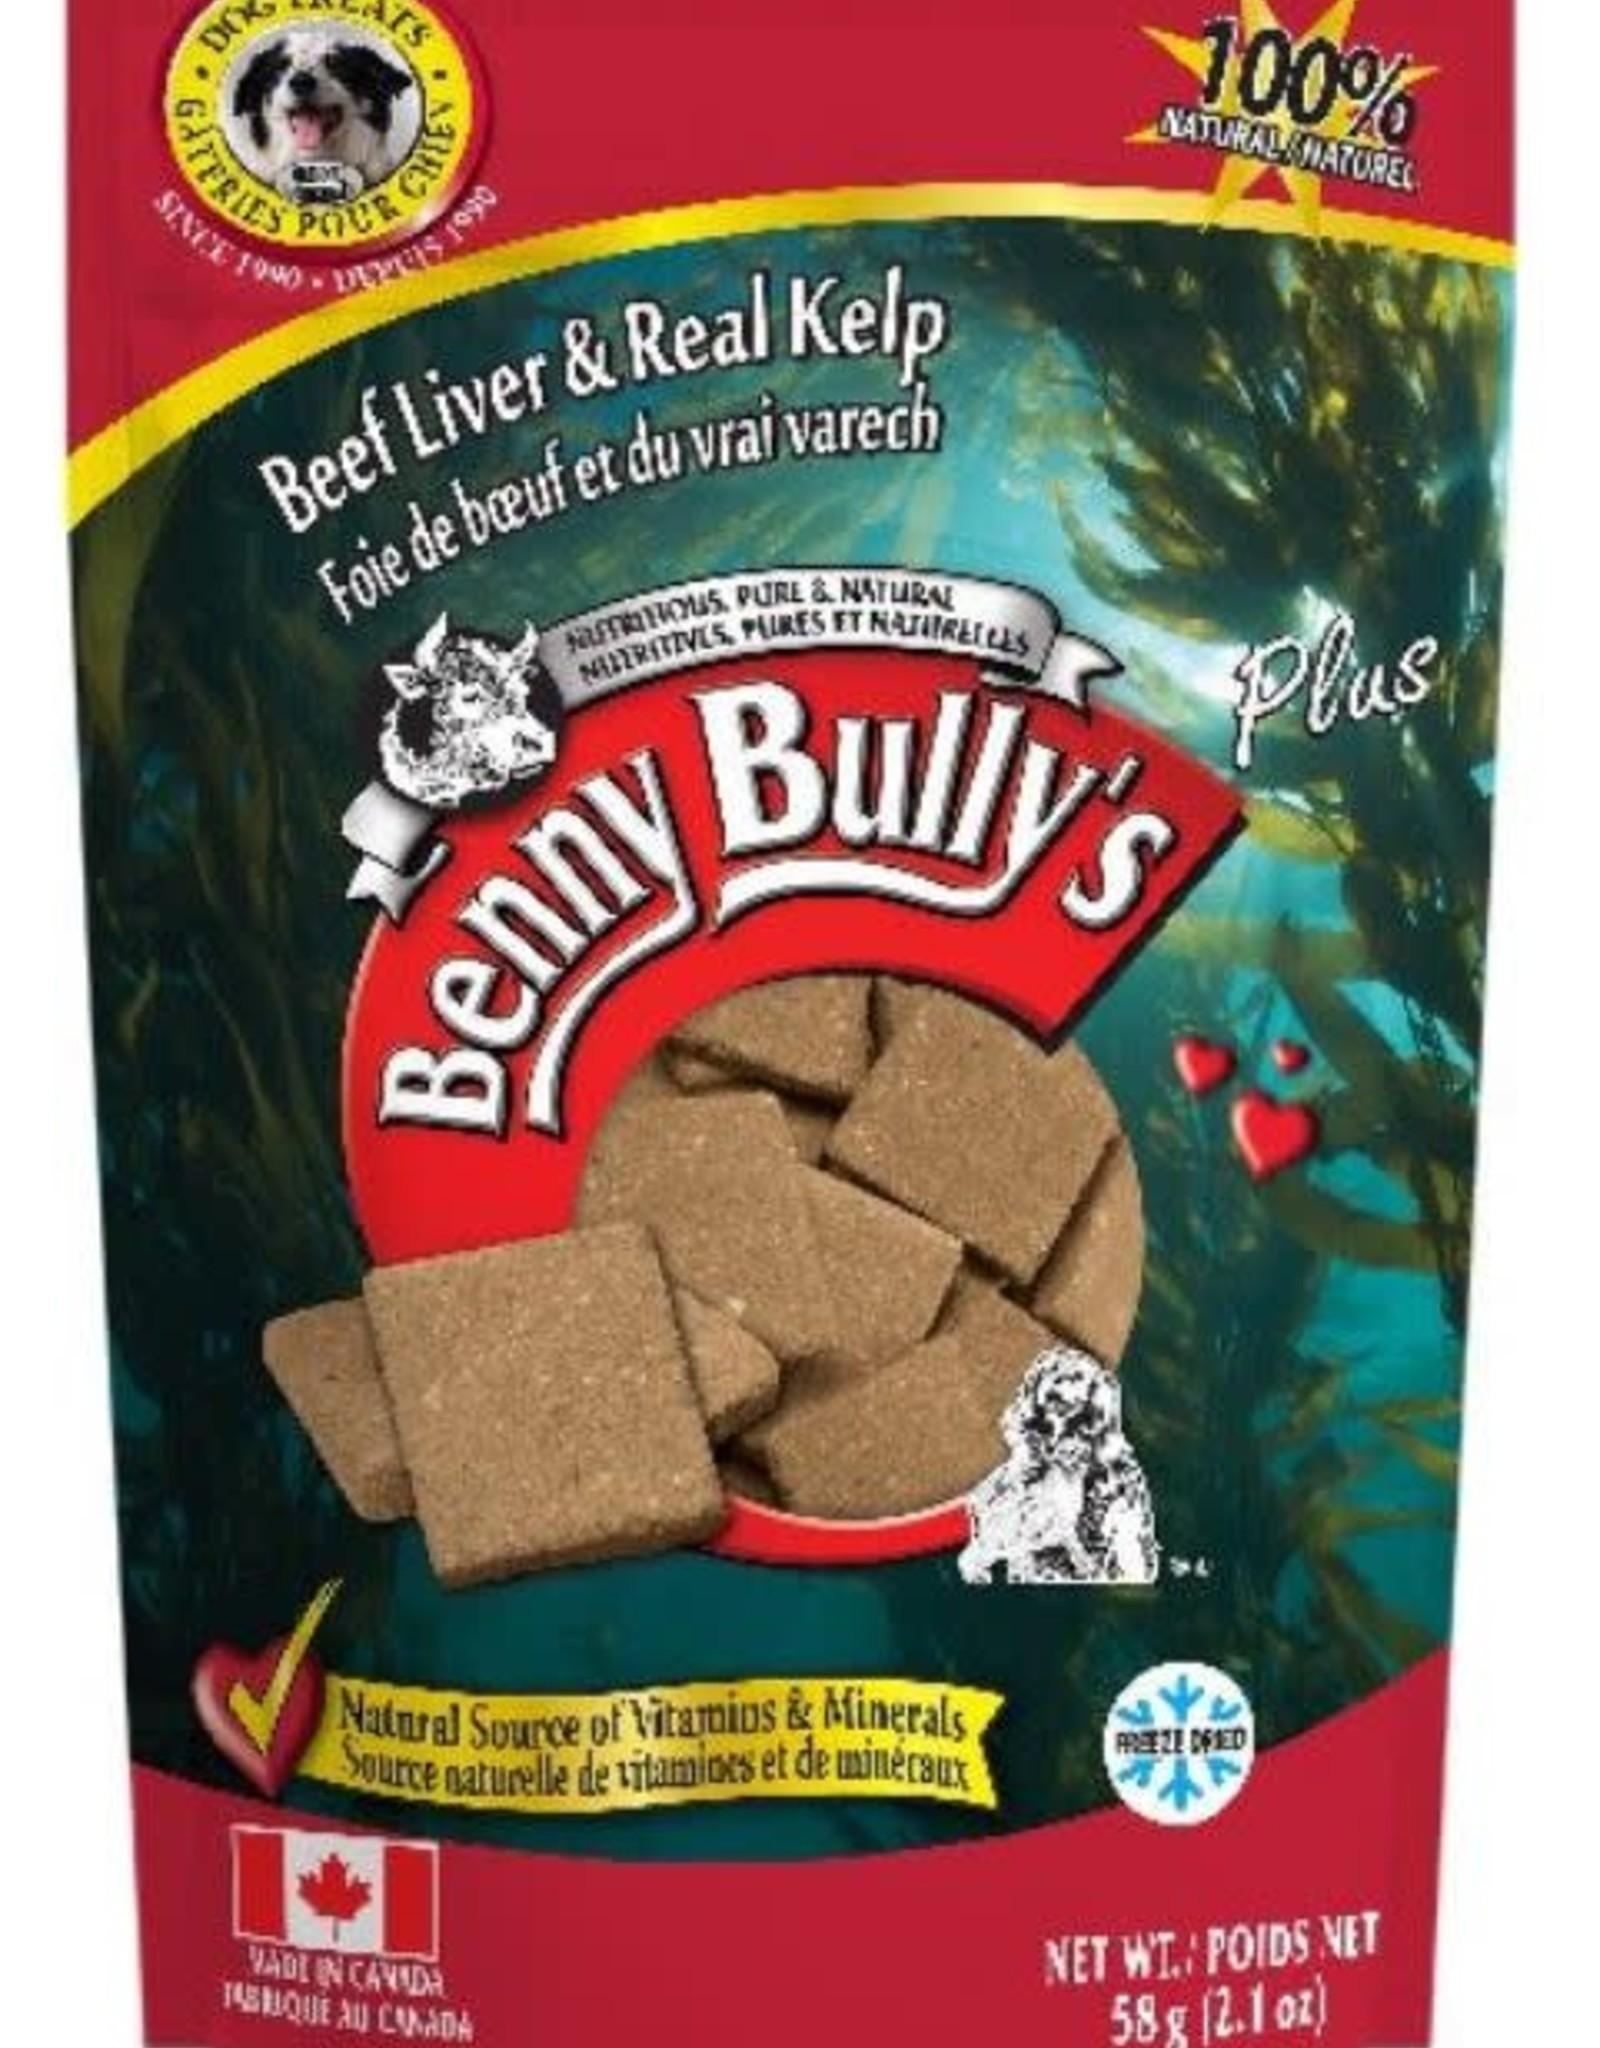 Benny Bully Benny Bullys LiverPlus Kelp 58g